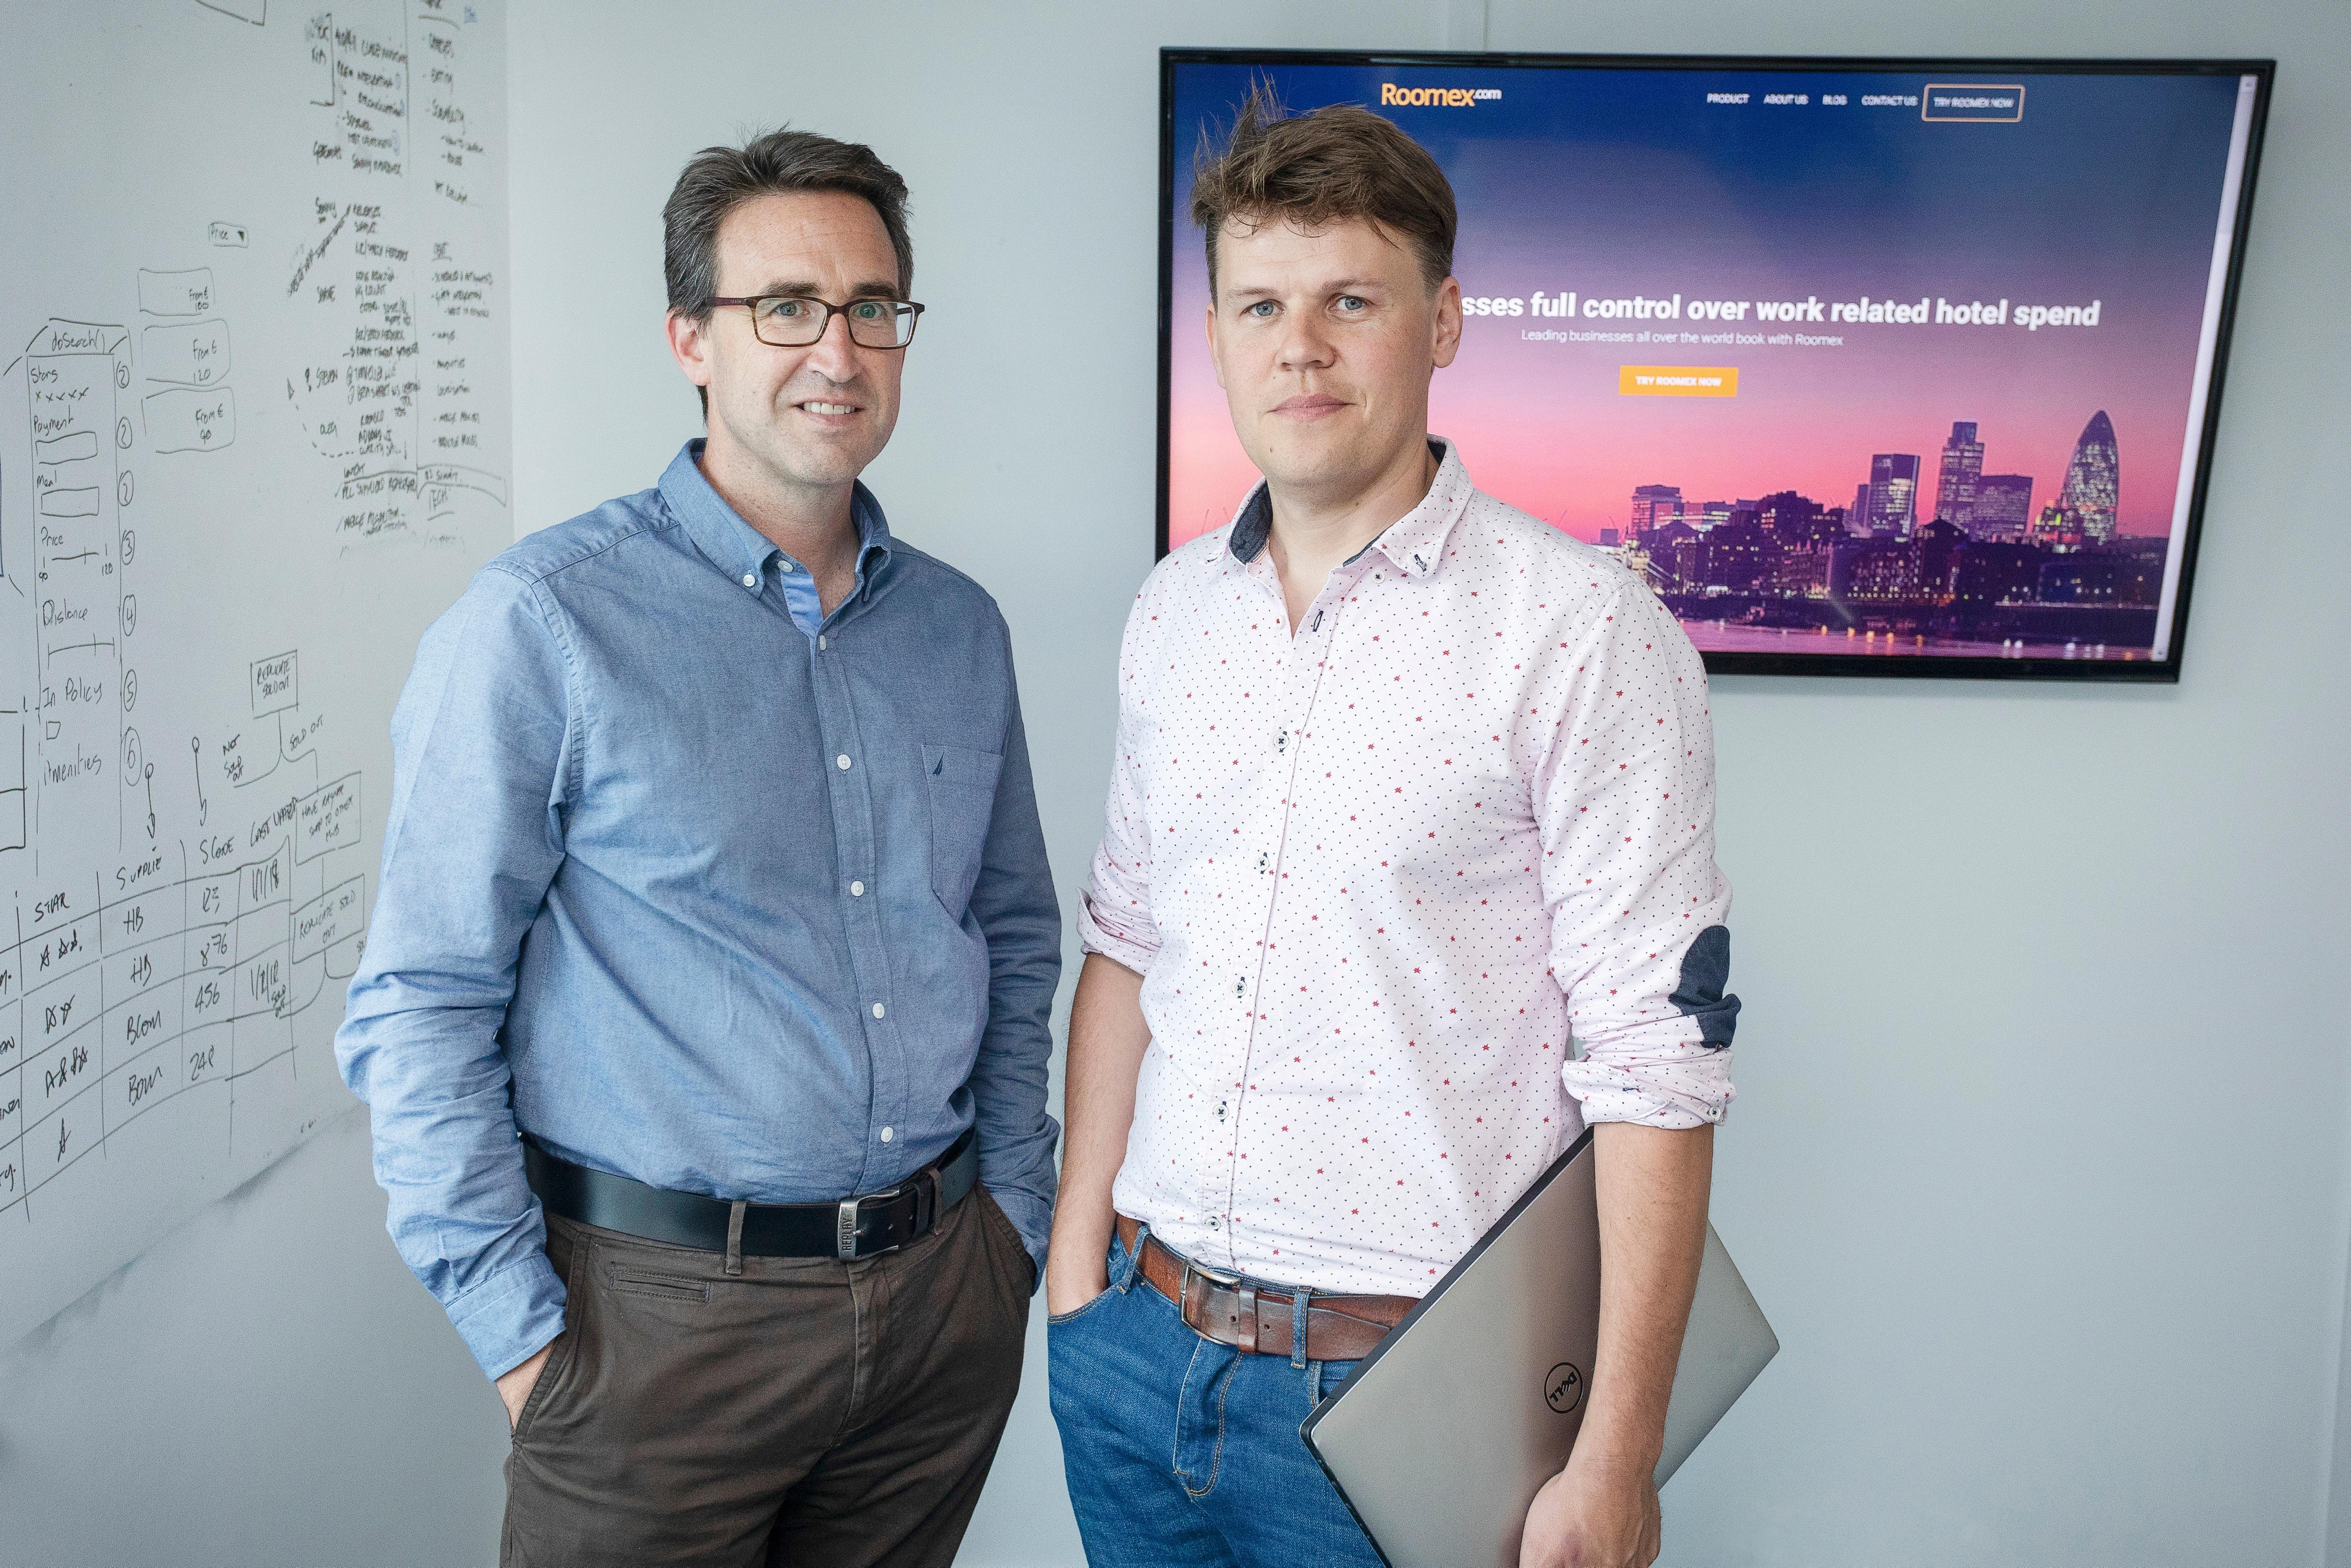 Roomex raises €8 million to build next generation tech platform for booking business travel